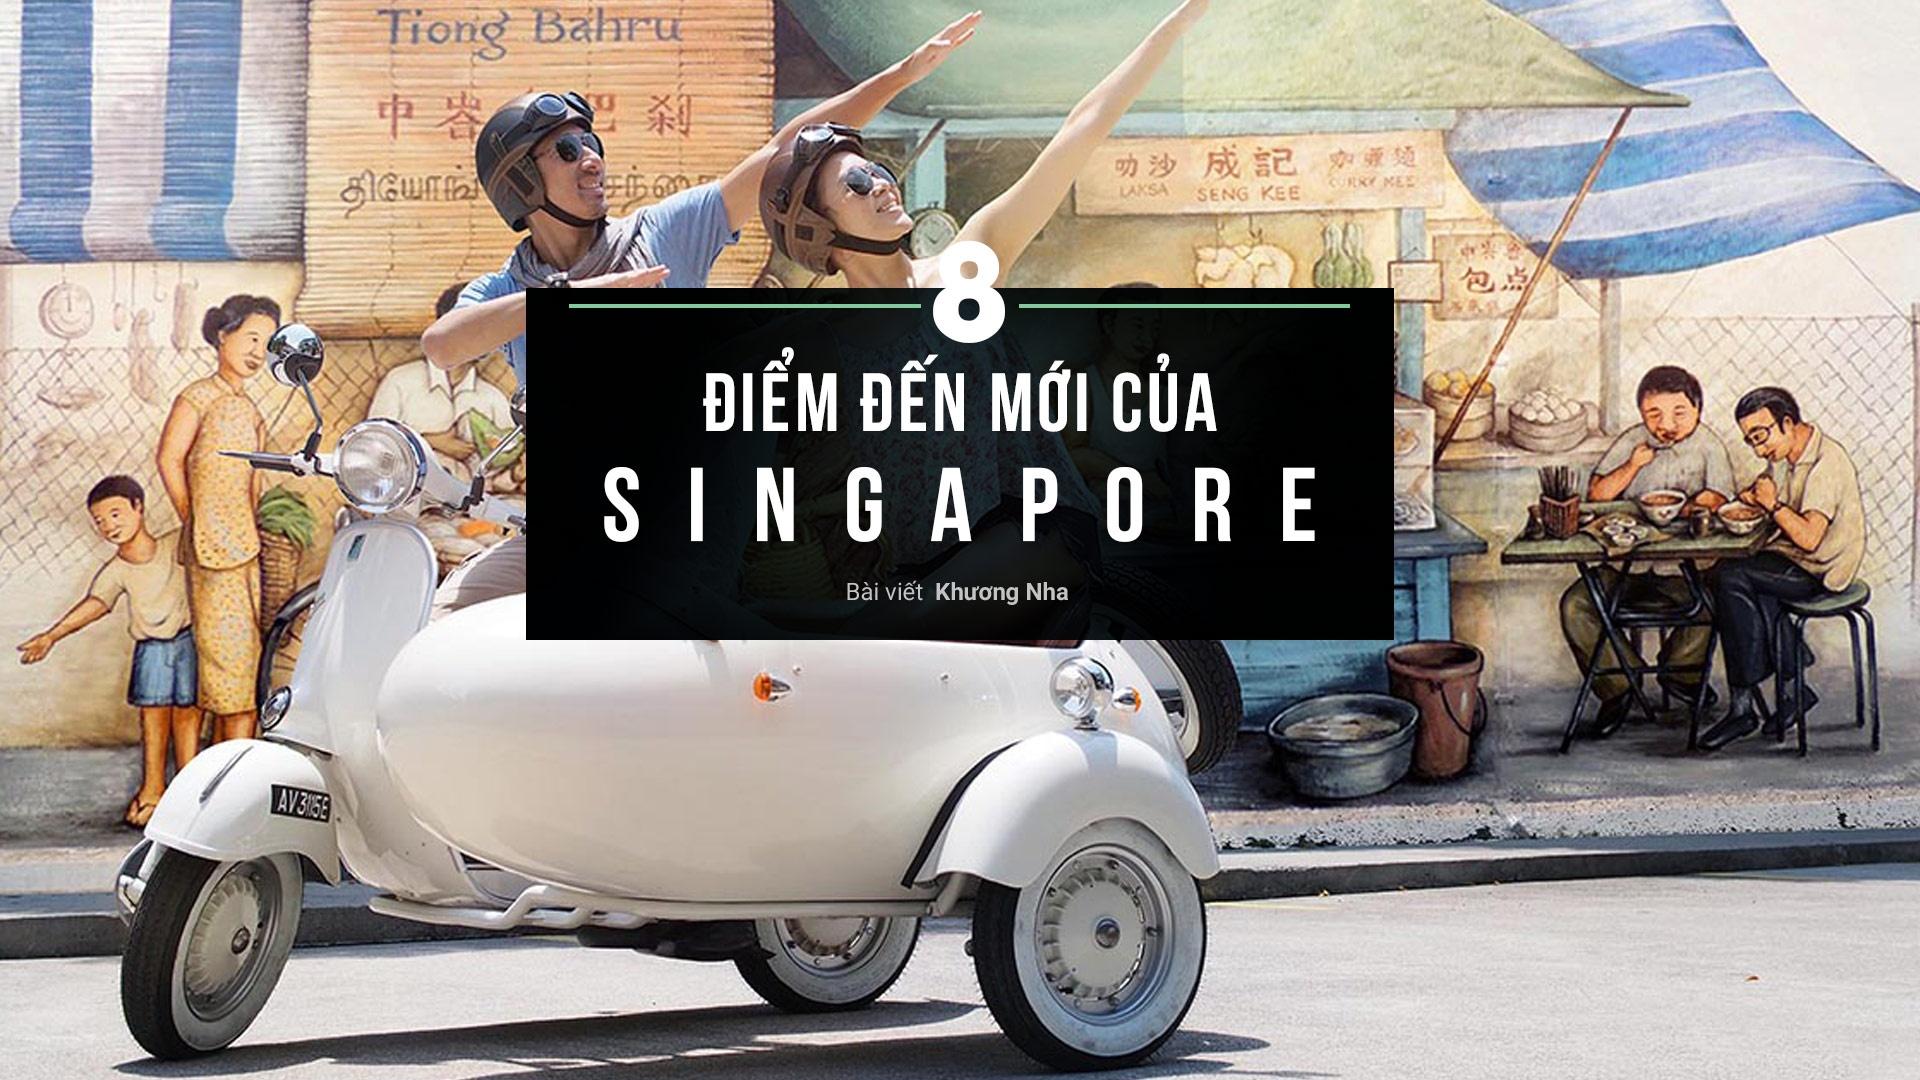 8 lua chon moi cho hanh trinh kham pha Singapore hinh anh 1